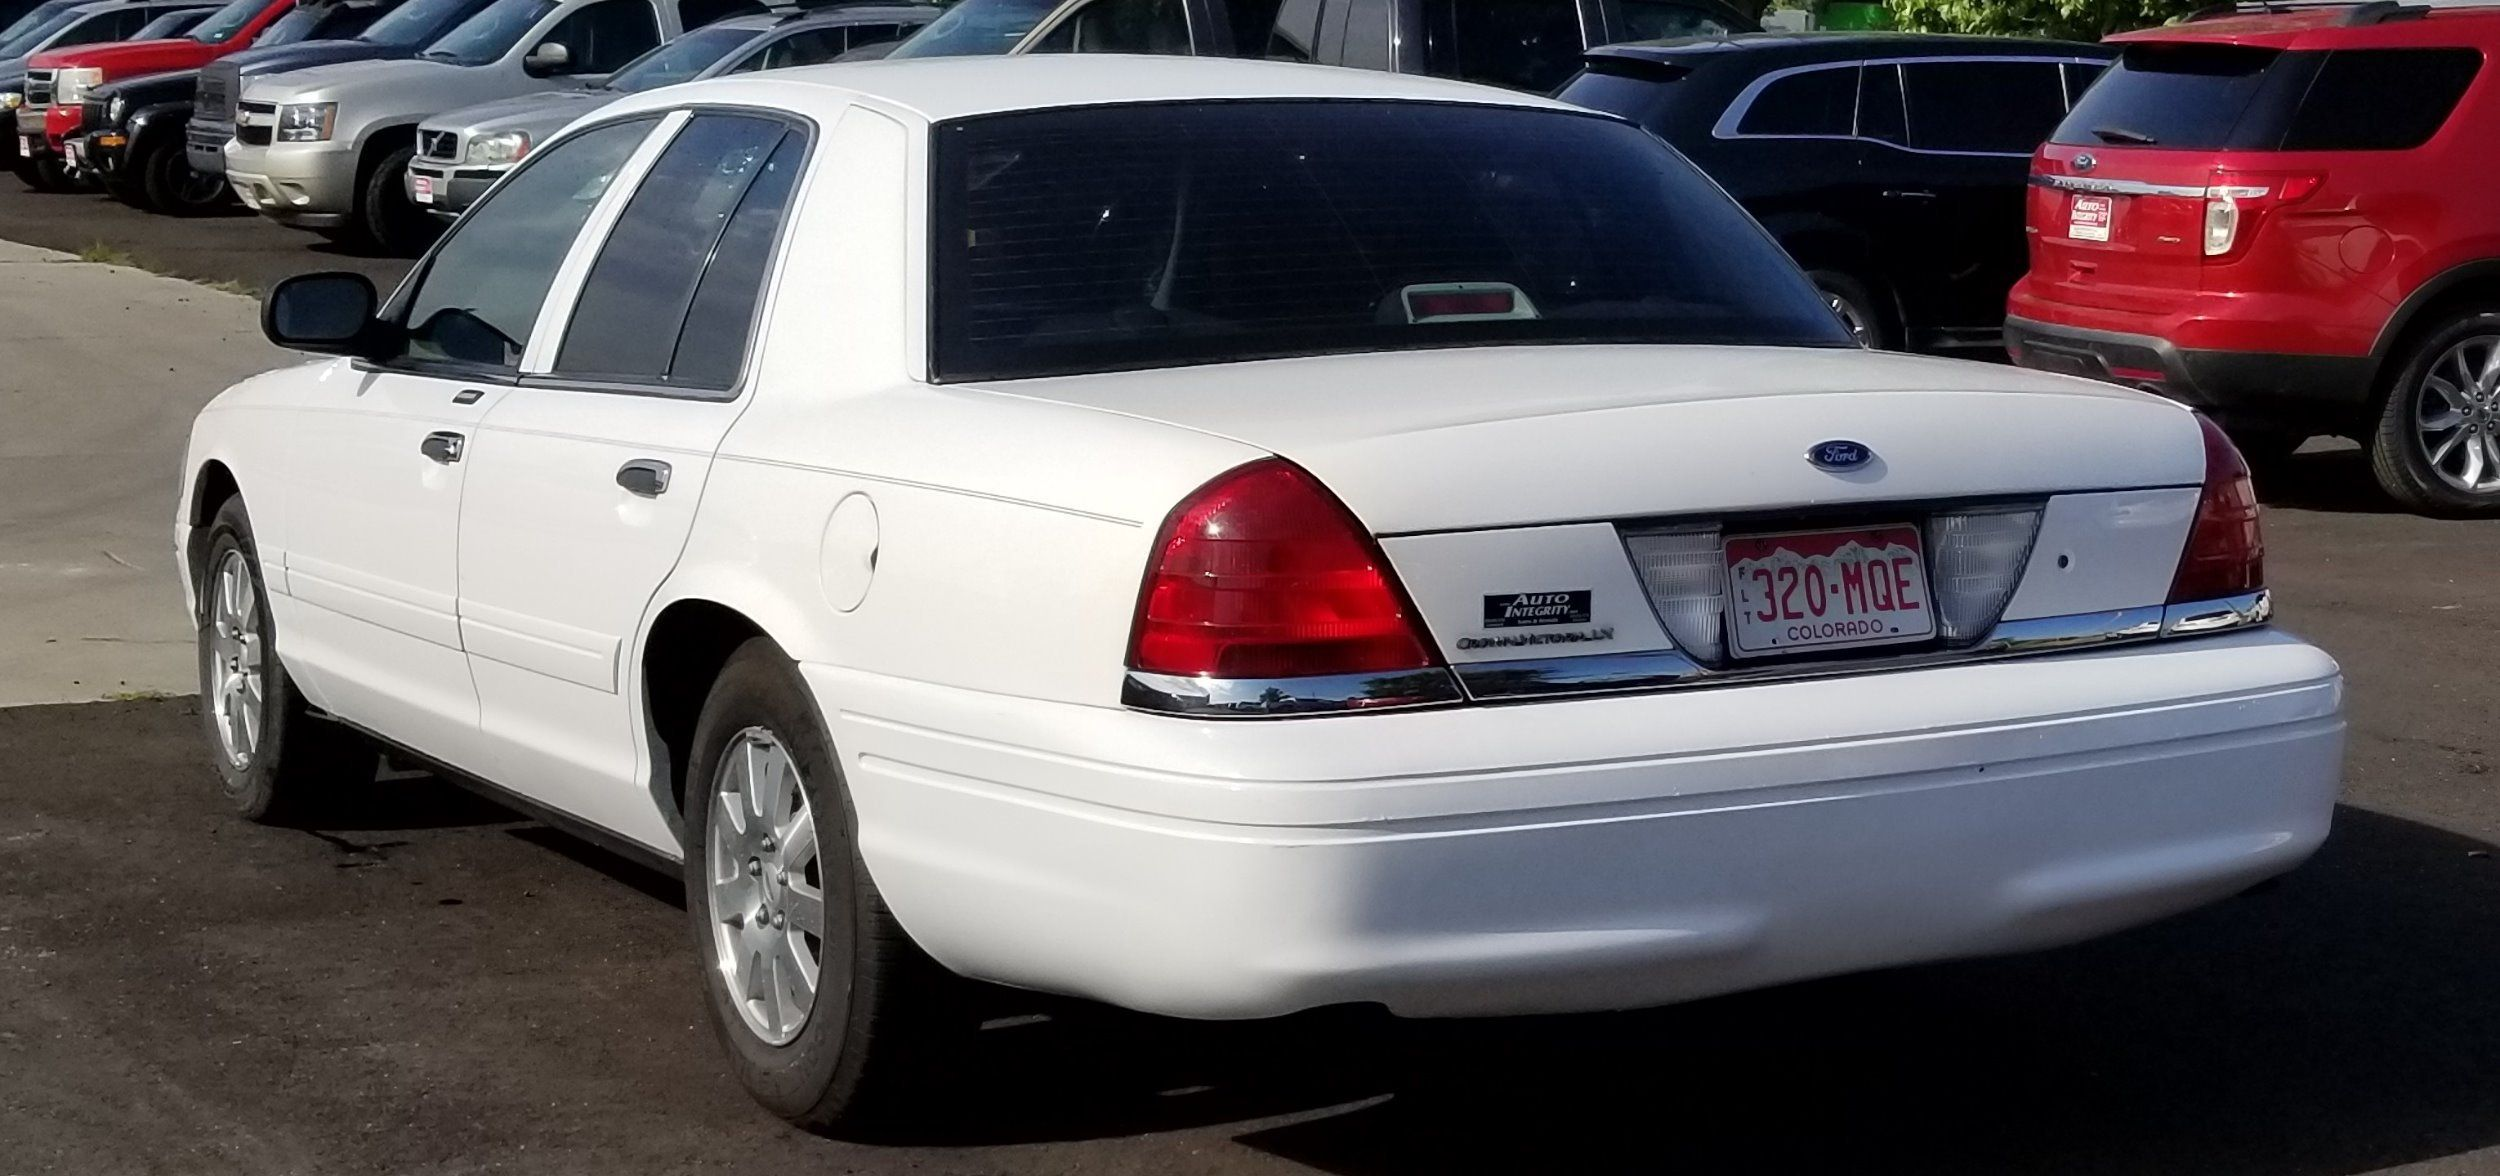 2008 Ford Crown Victoria LX | Auto Integrity